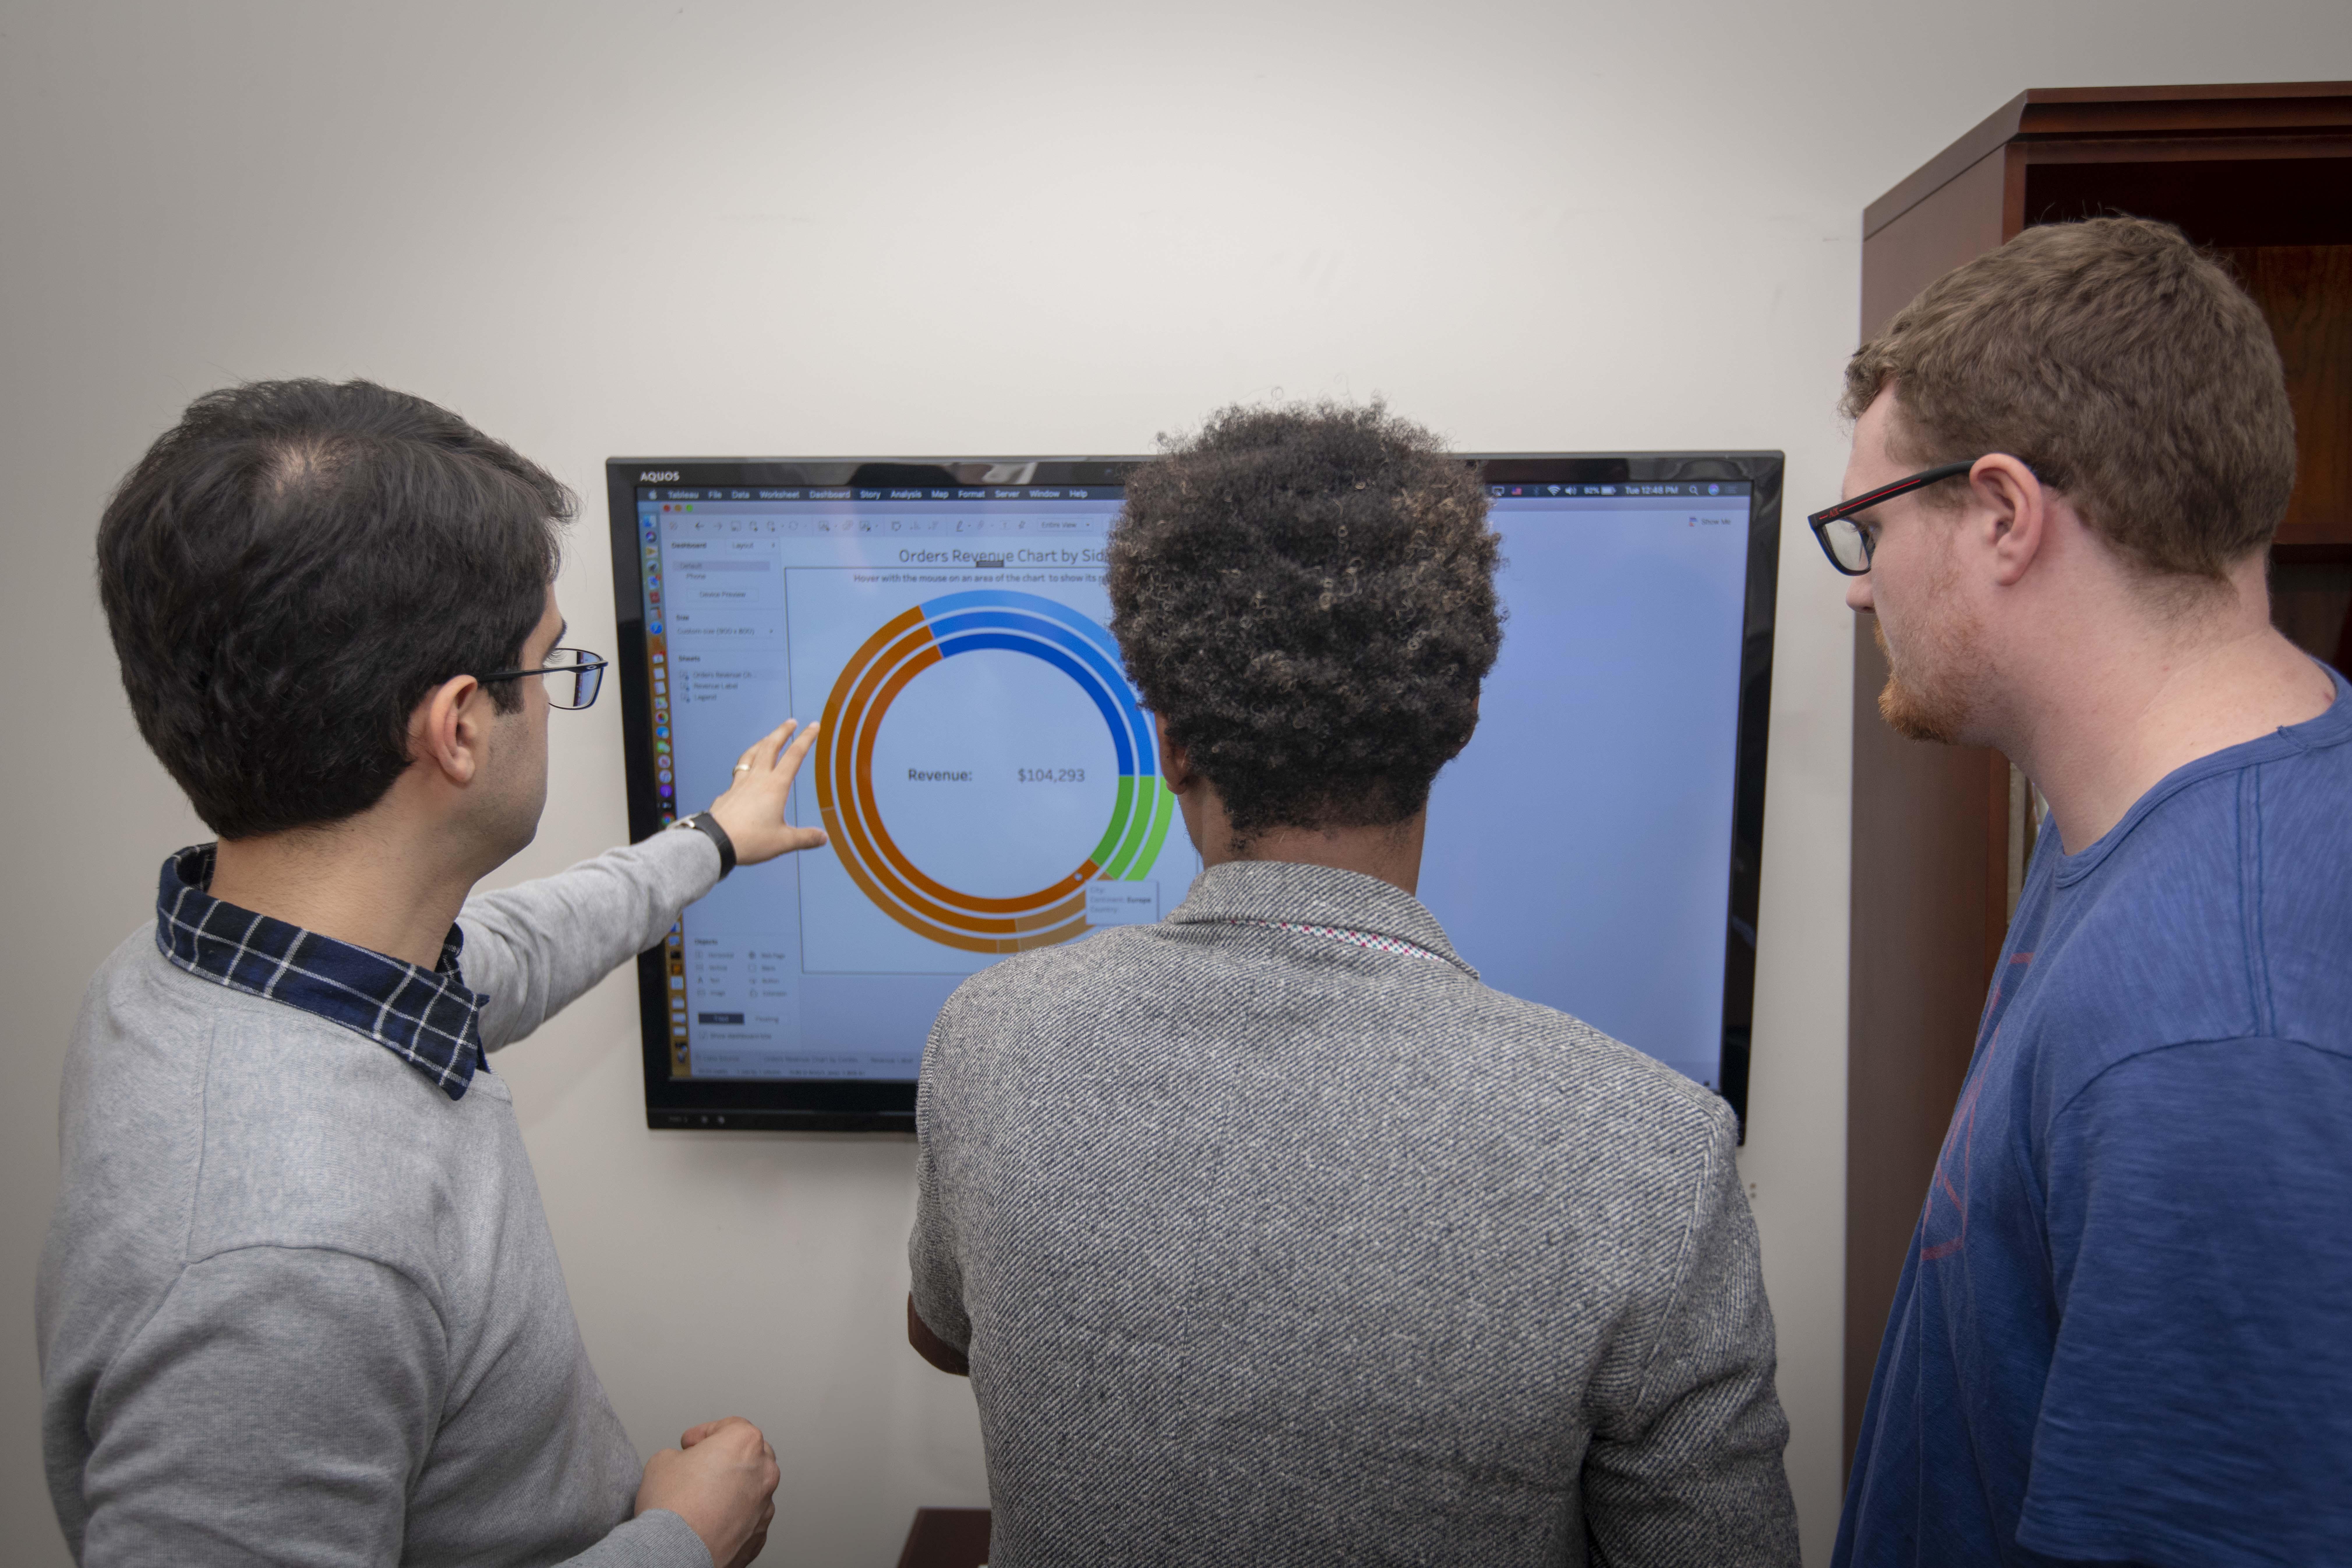 Three men at a data whiteboard.